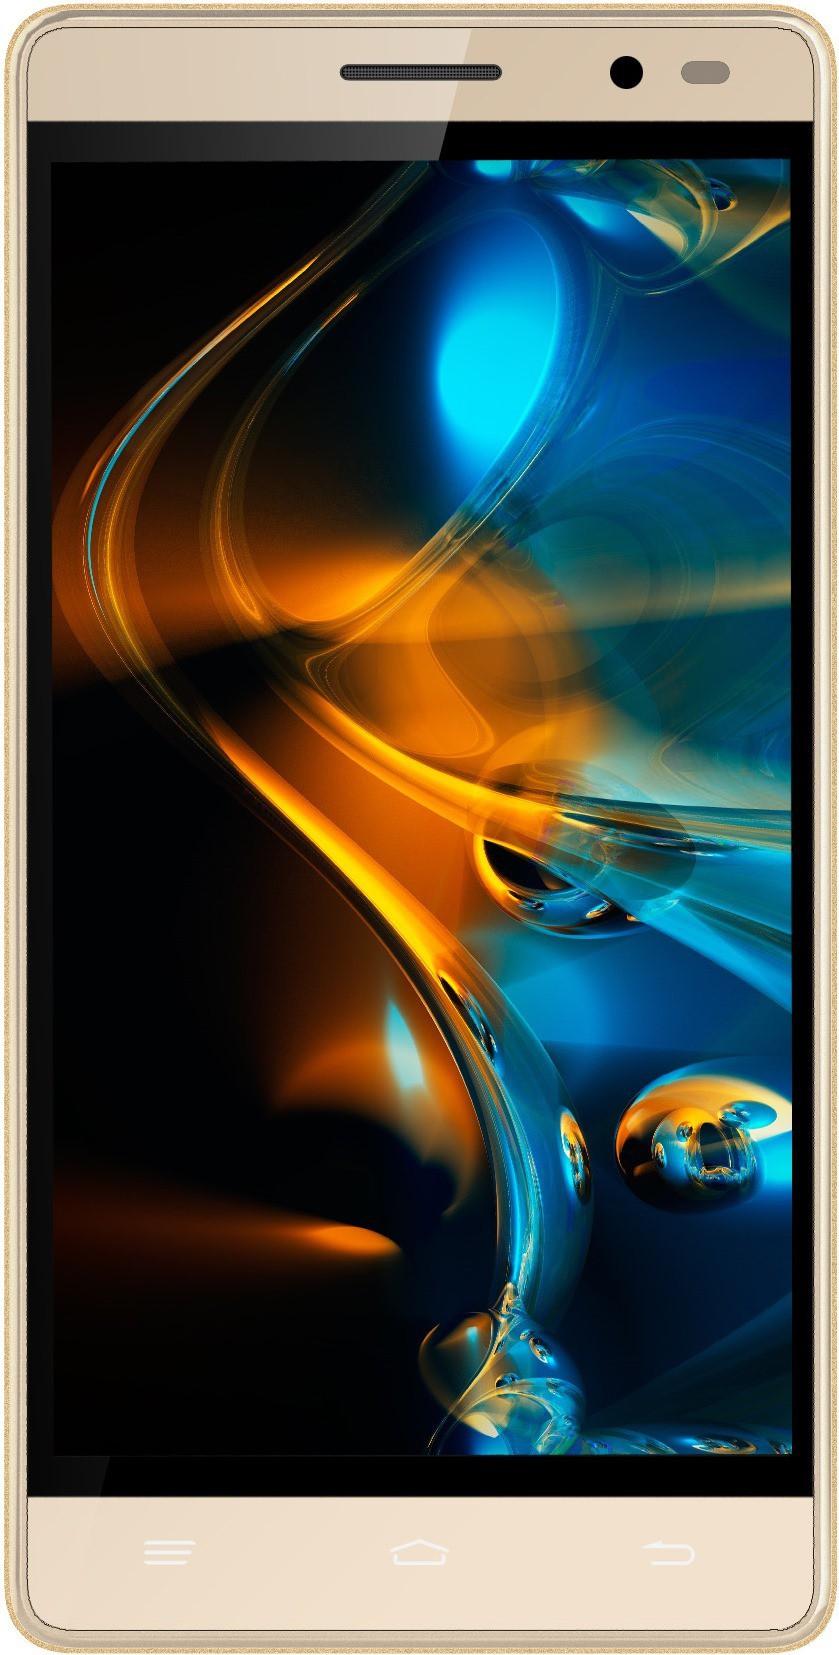 Intex Aqua Power HD (Champagne, 16 GB)(2 GB RAM)